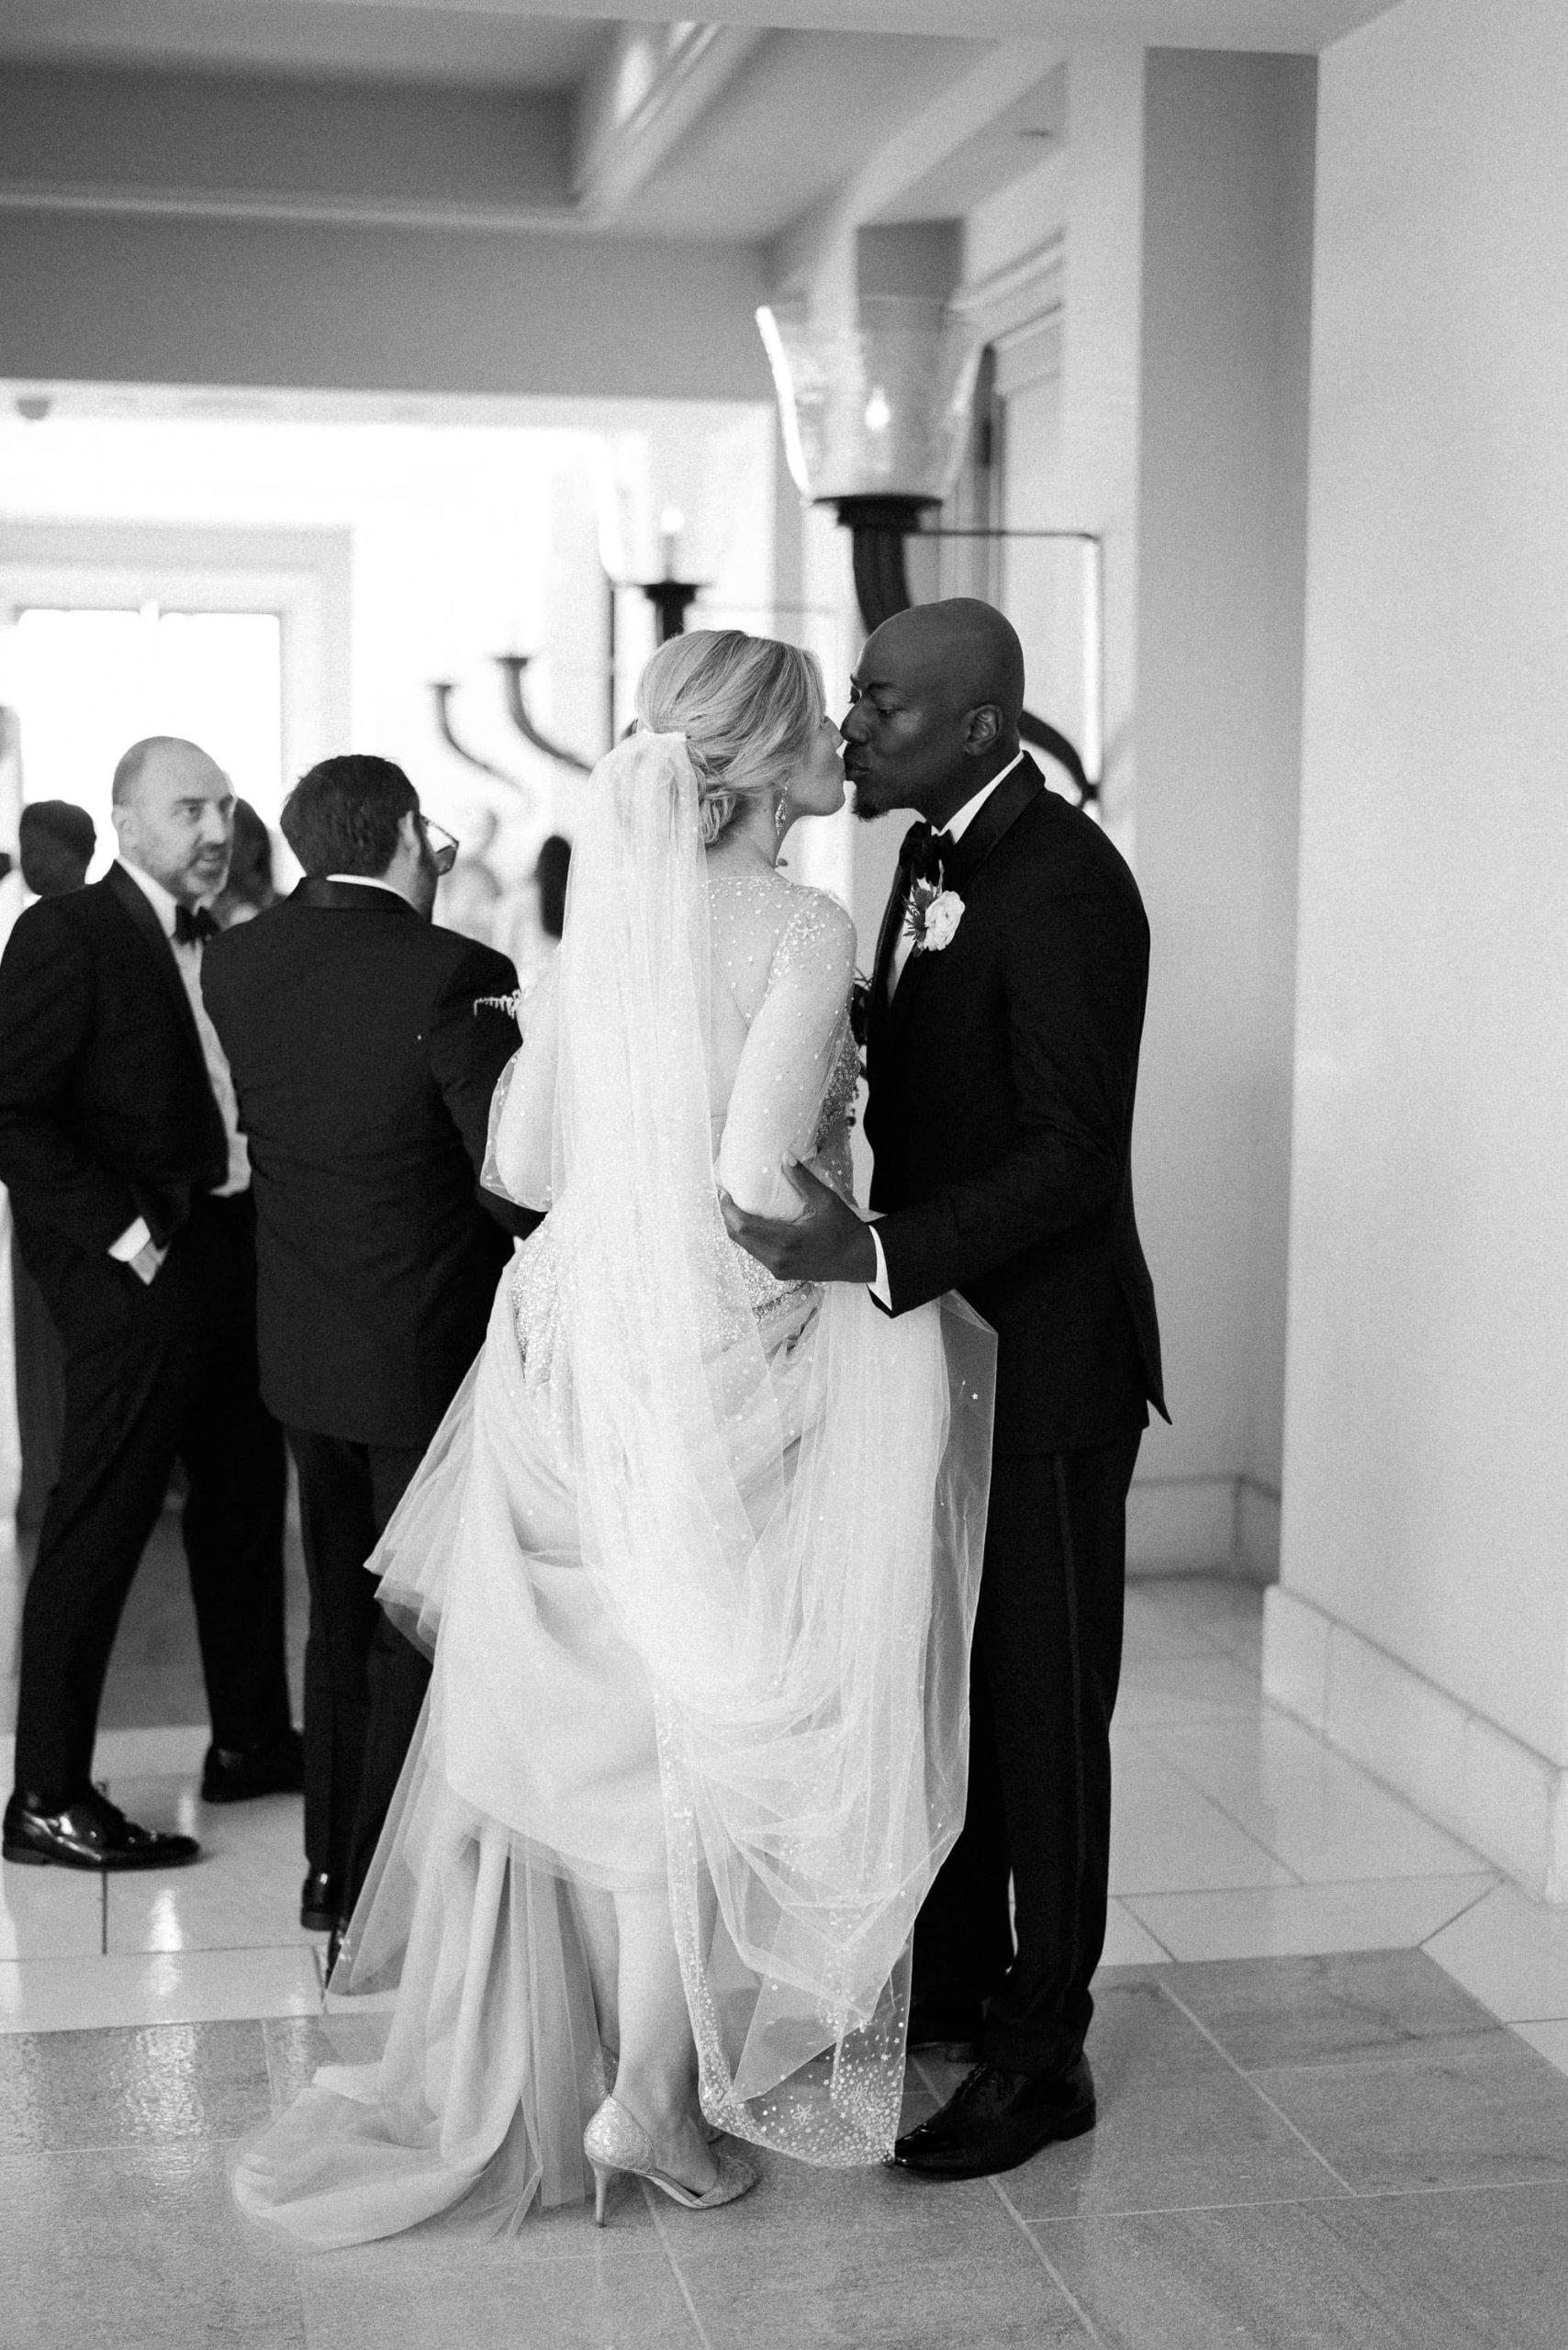 Bride and groom kiss at Maui wedding at Four Seasons Resort Maui in Wailea, Hawaii | Photo by James x Schulze